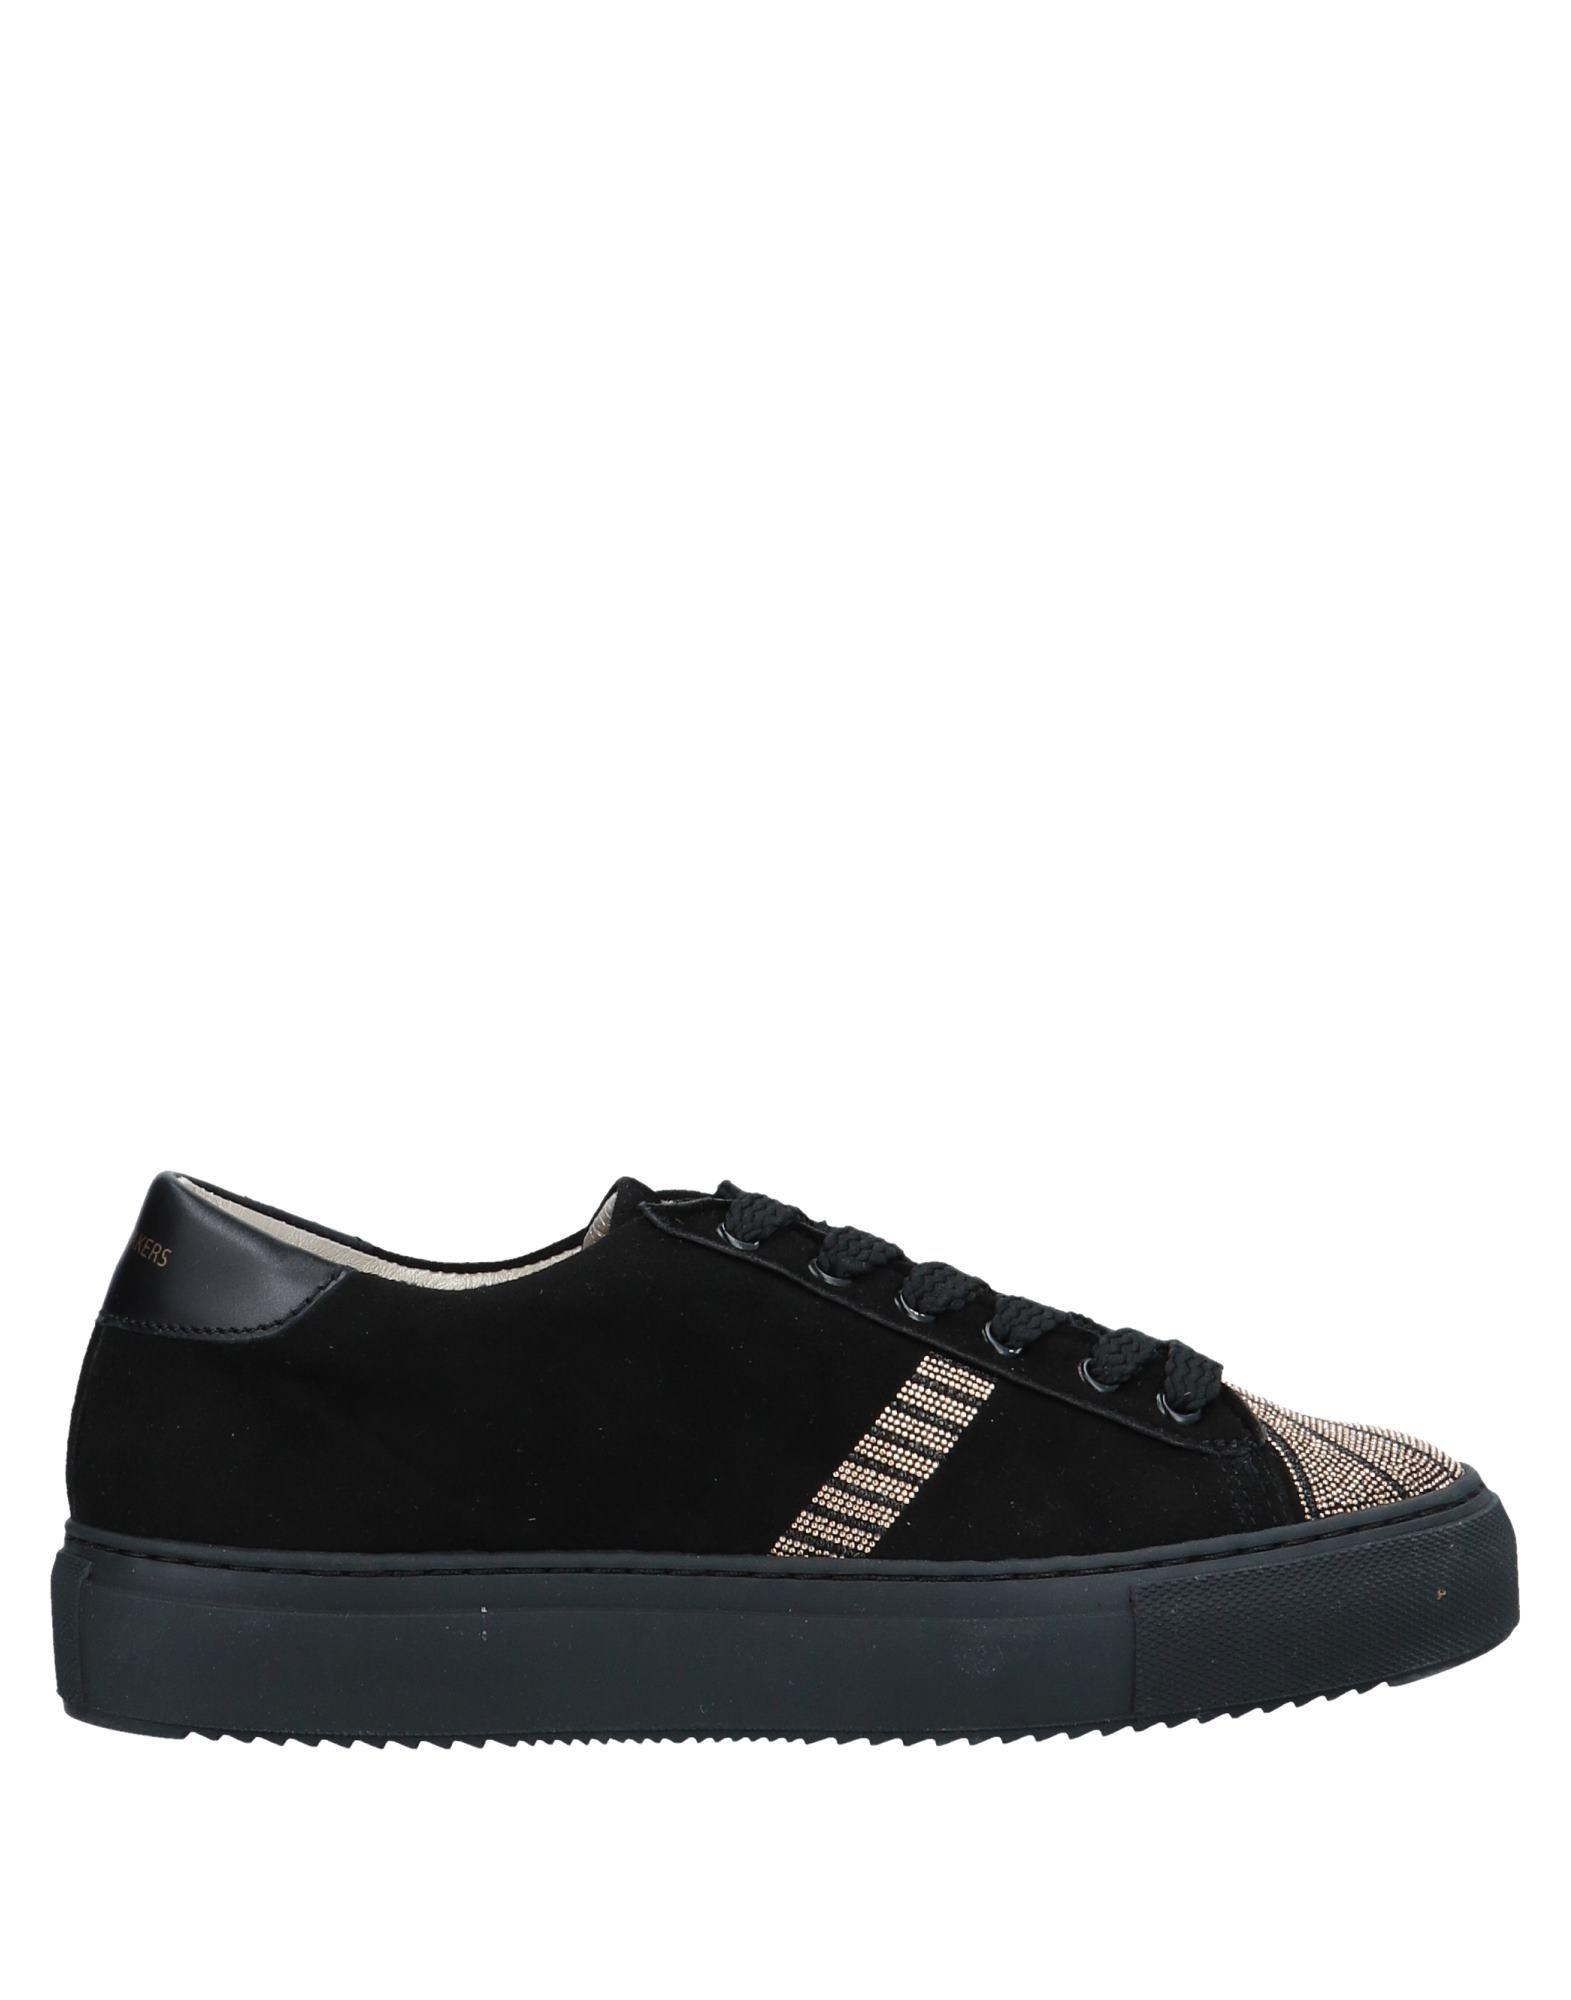 D.A.T.E. Sneakers - Women  D.A.T.E. Sneakers online on  Women Canada - 11557878XM 92c0d3